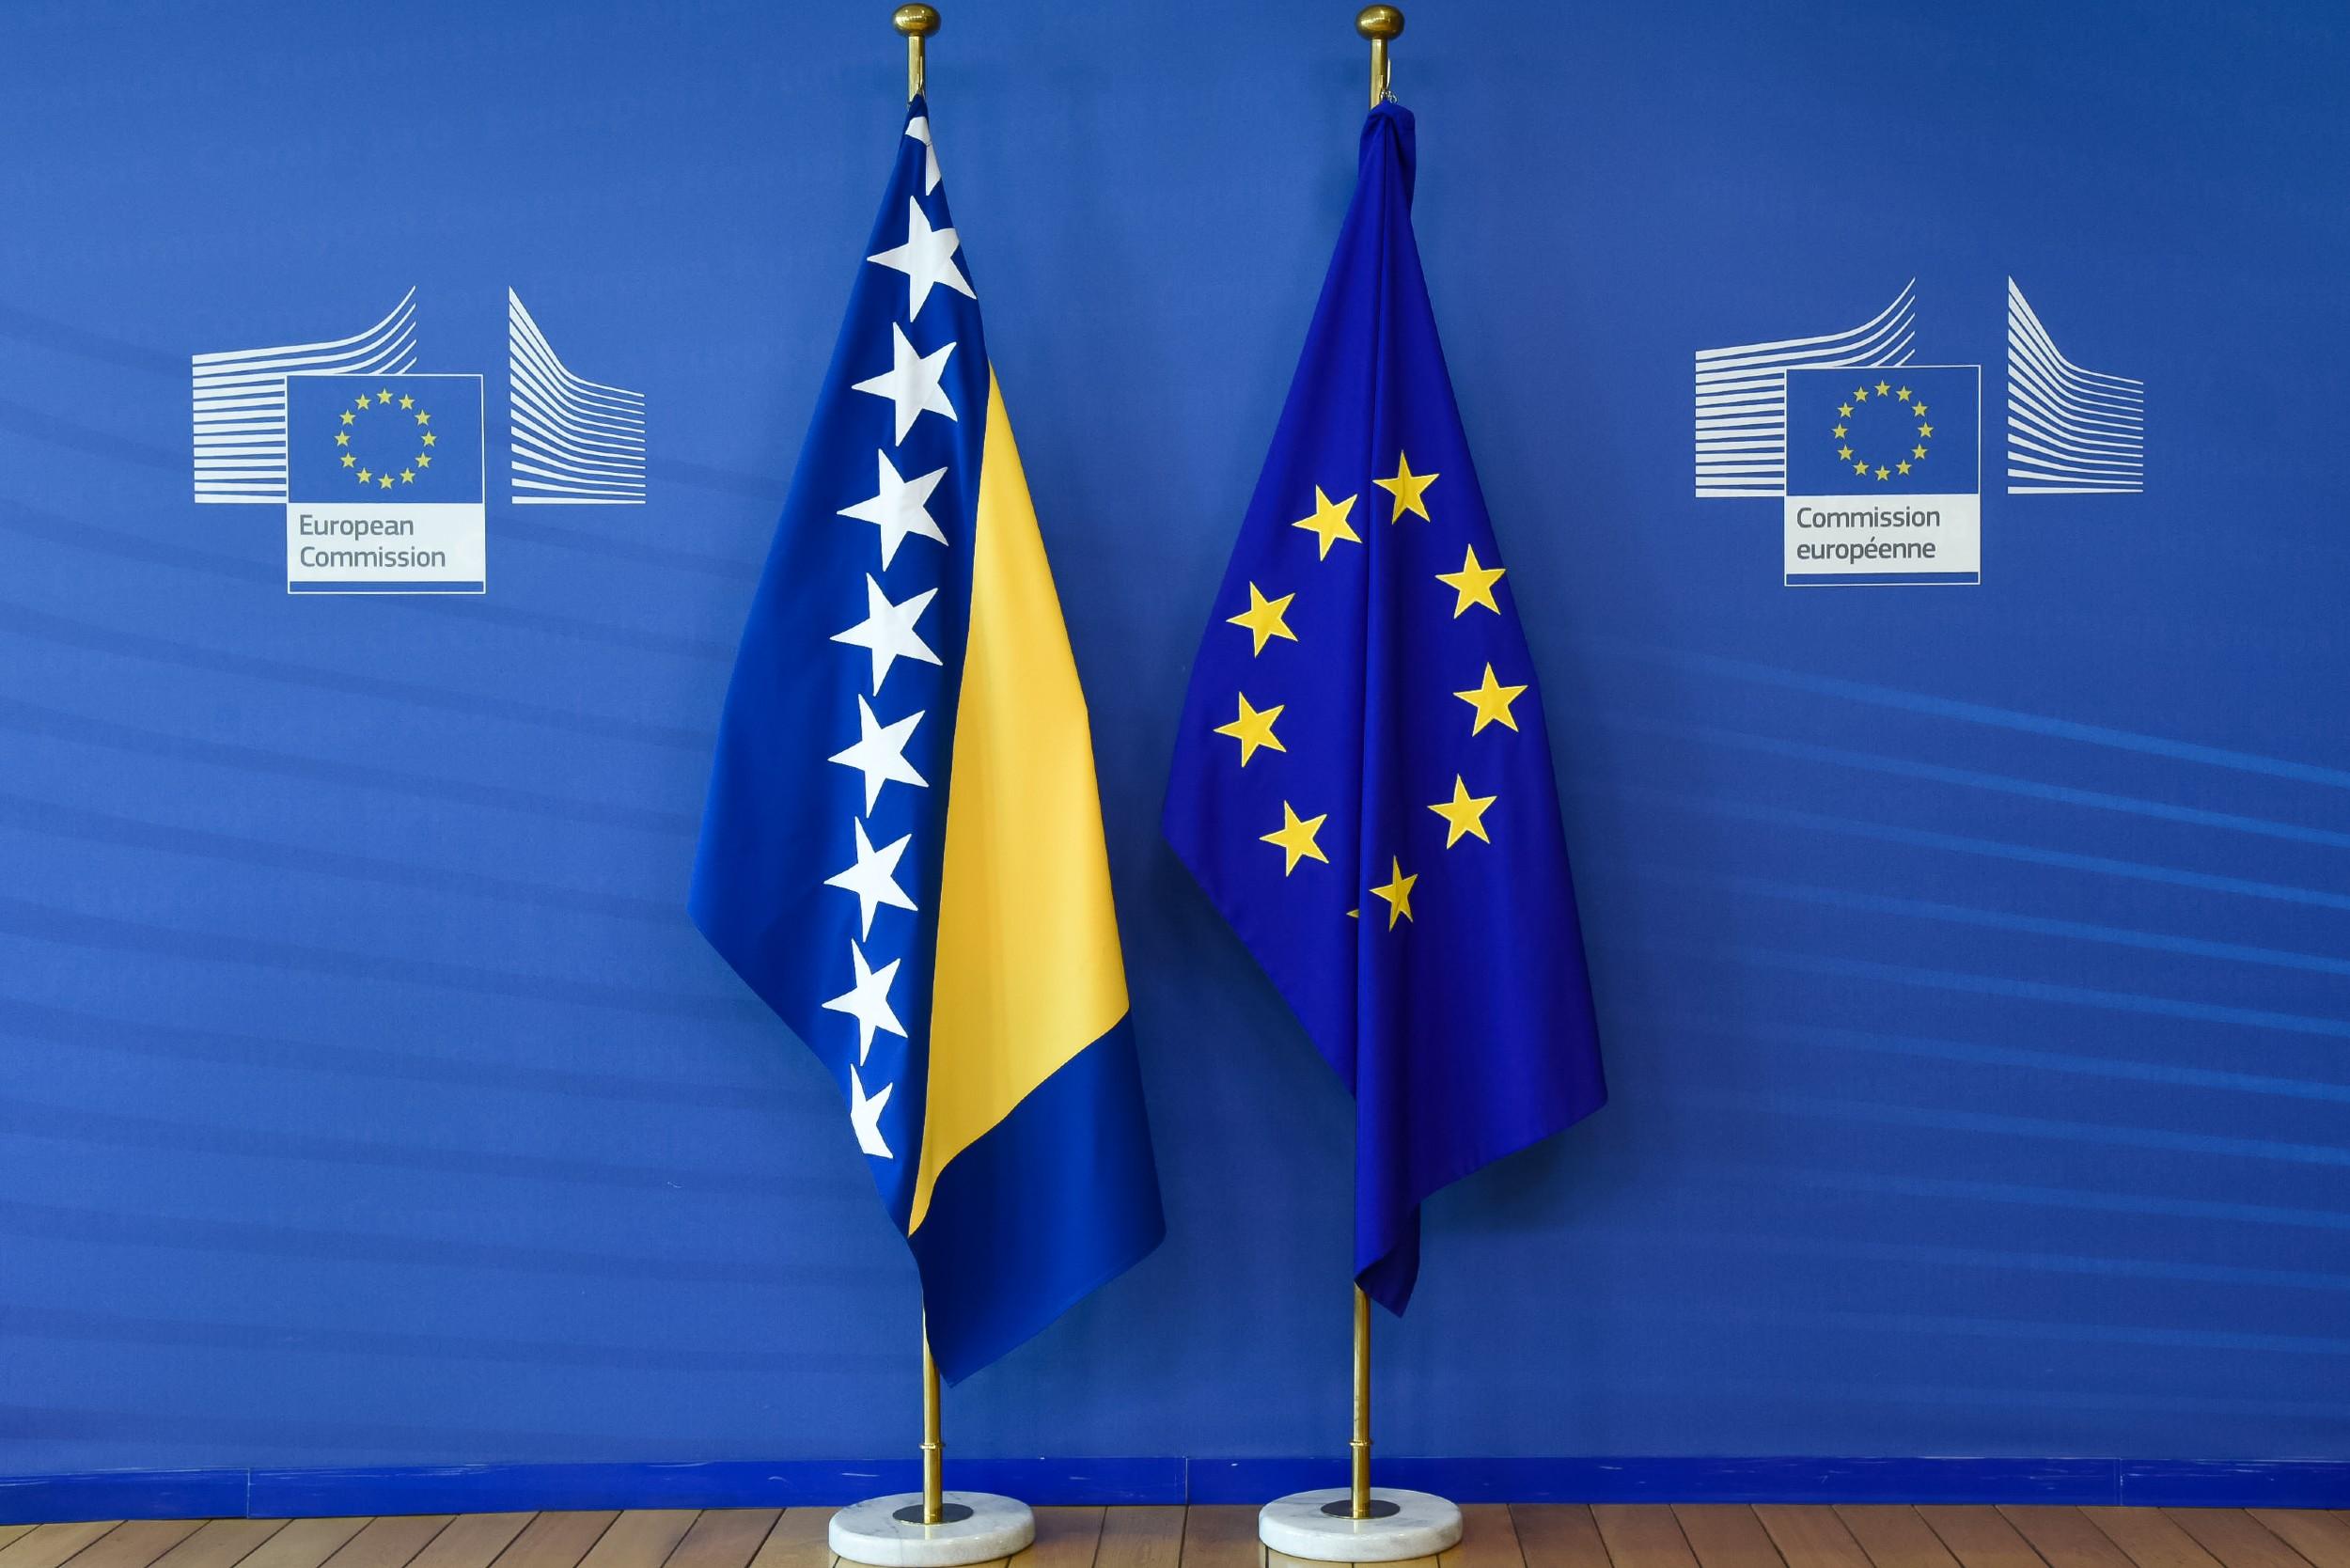 Zastave Bosne i Hercegovine i Evropske unije (Foto: European Commission)